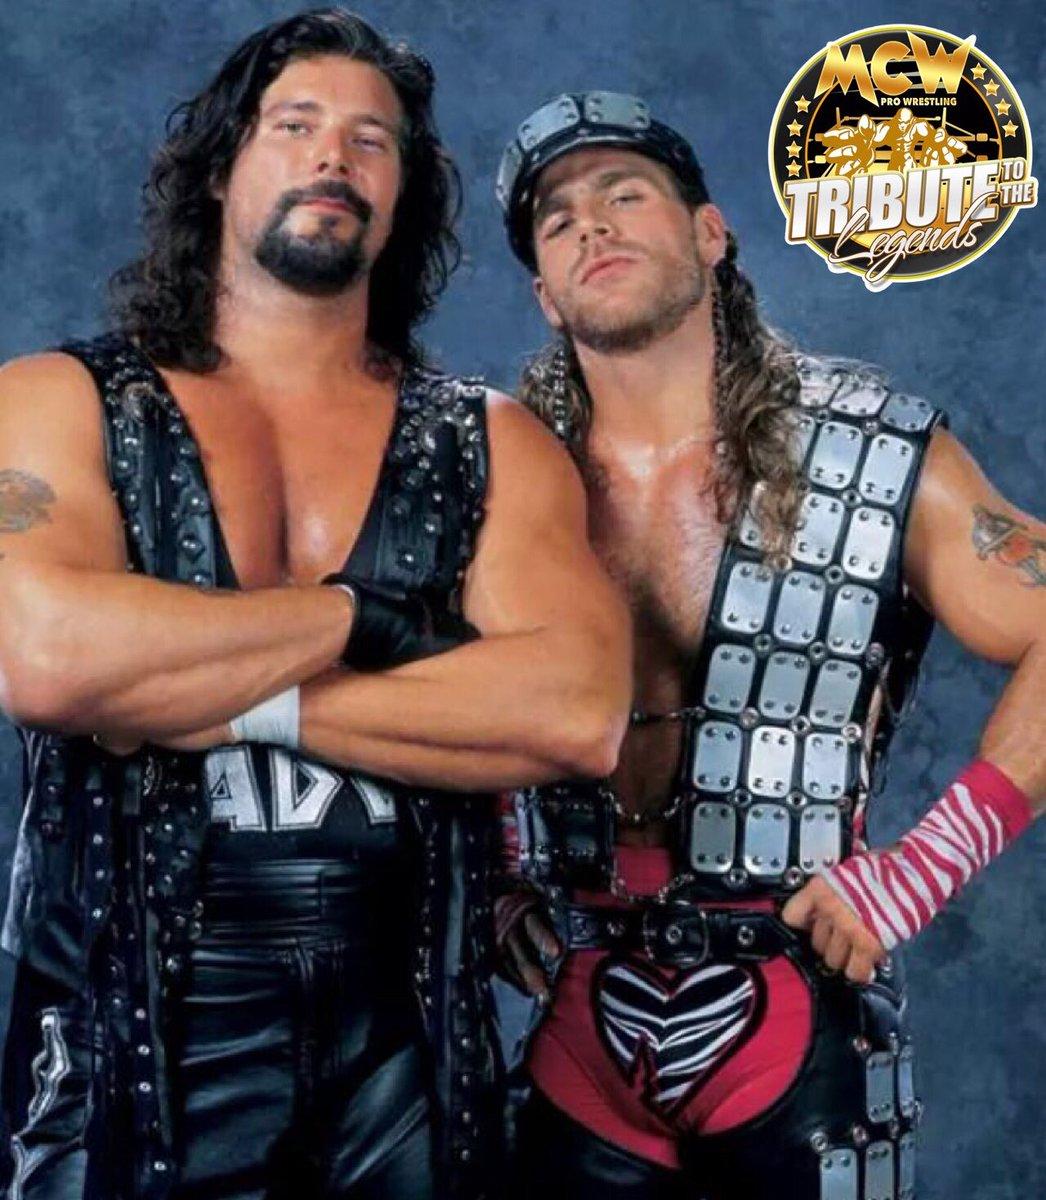 Two dudes wrestle